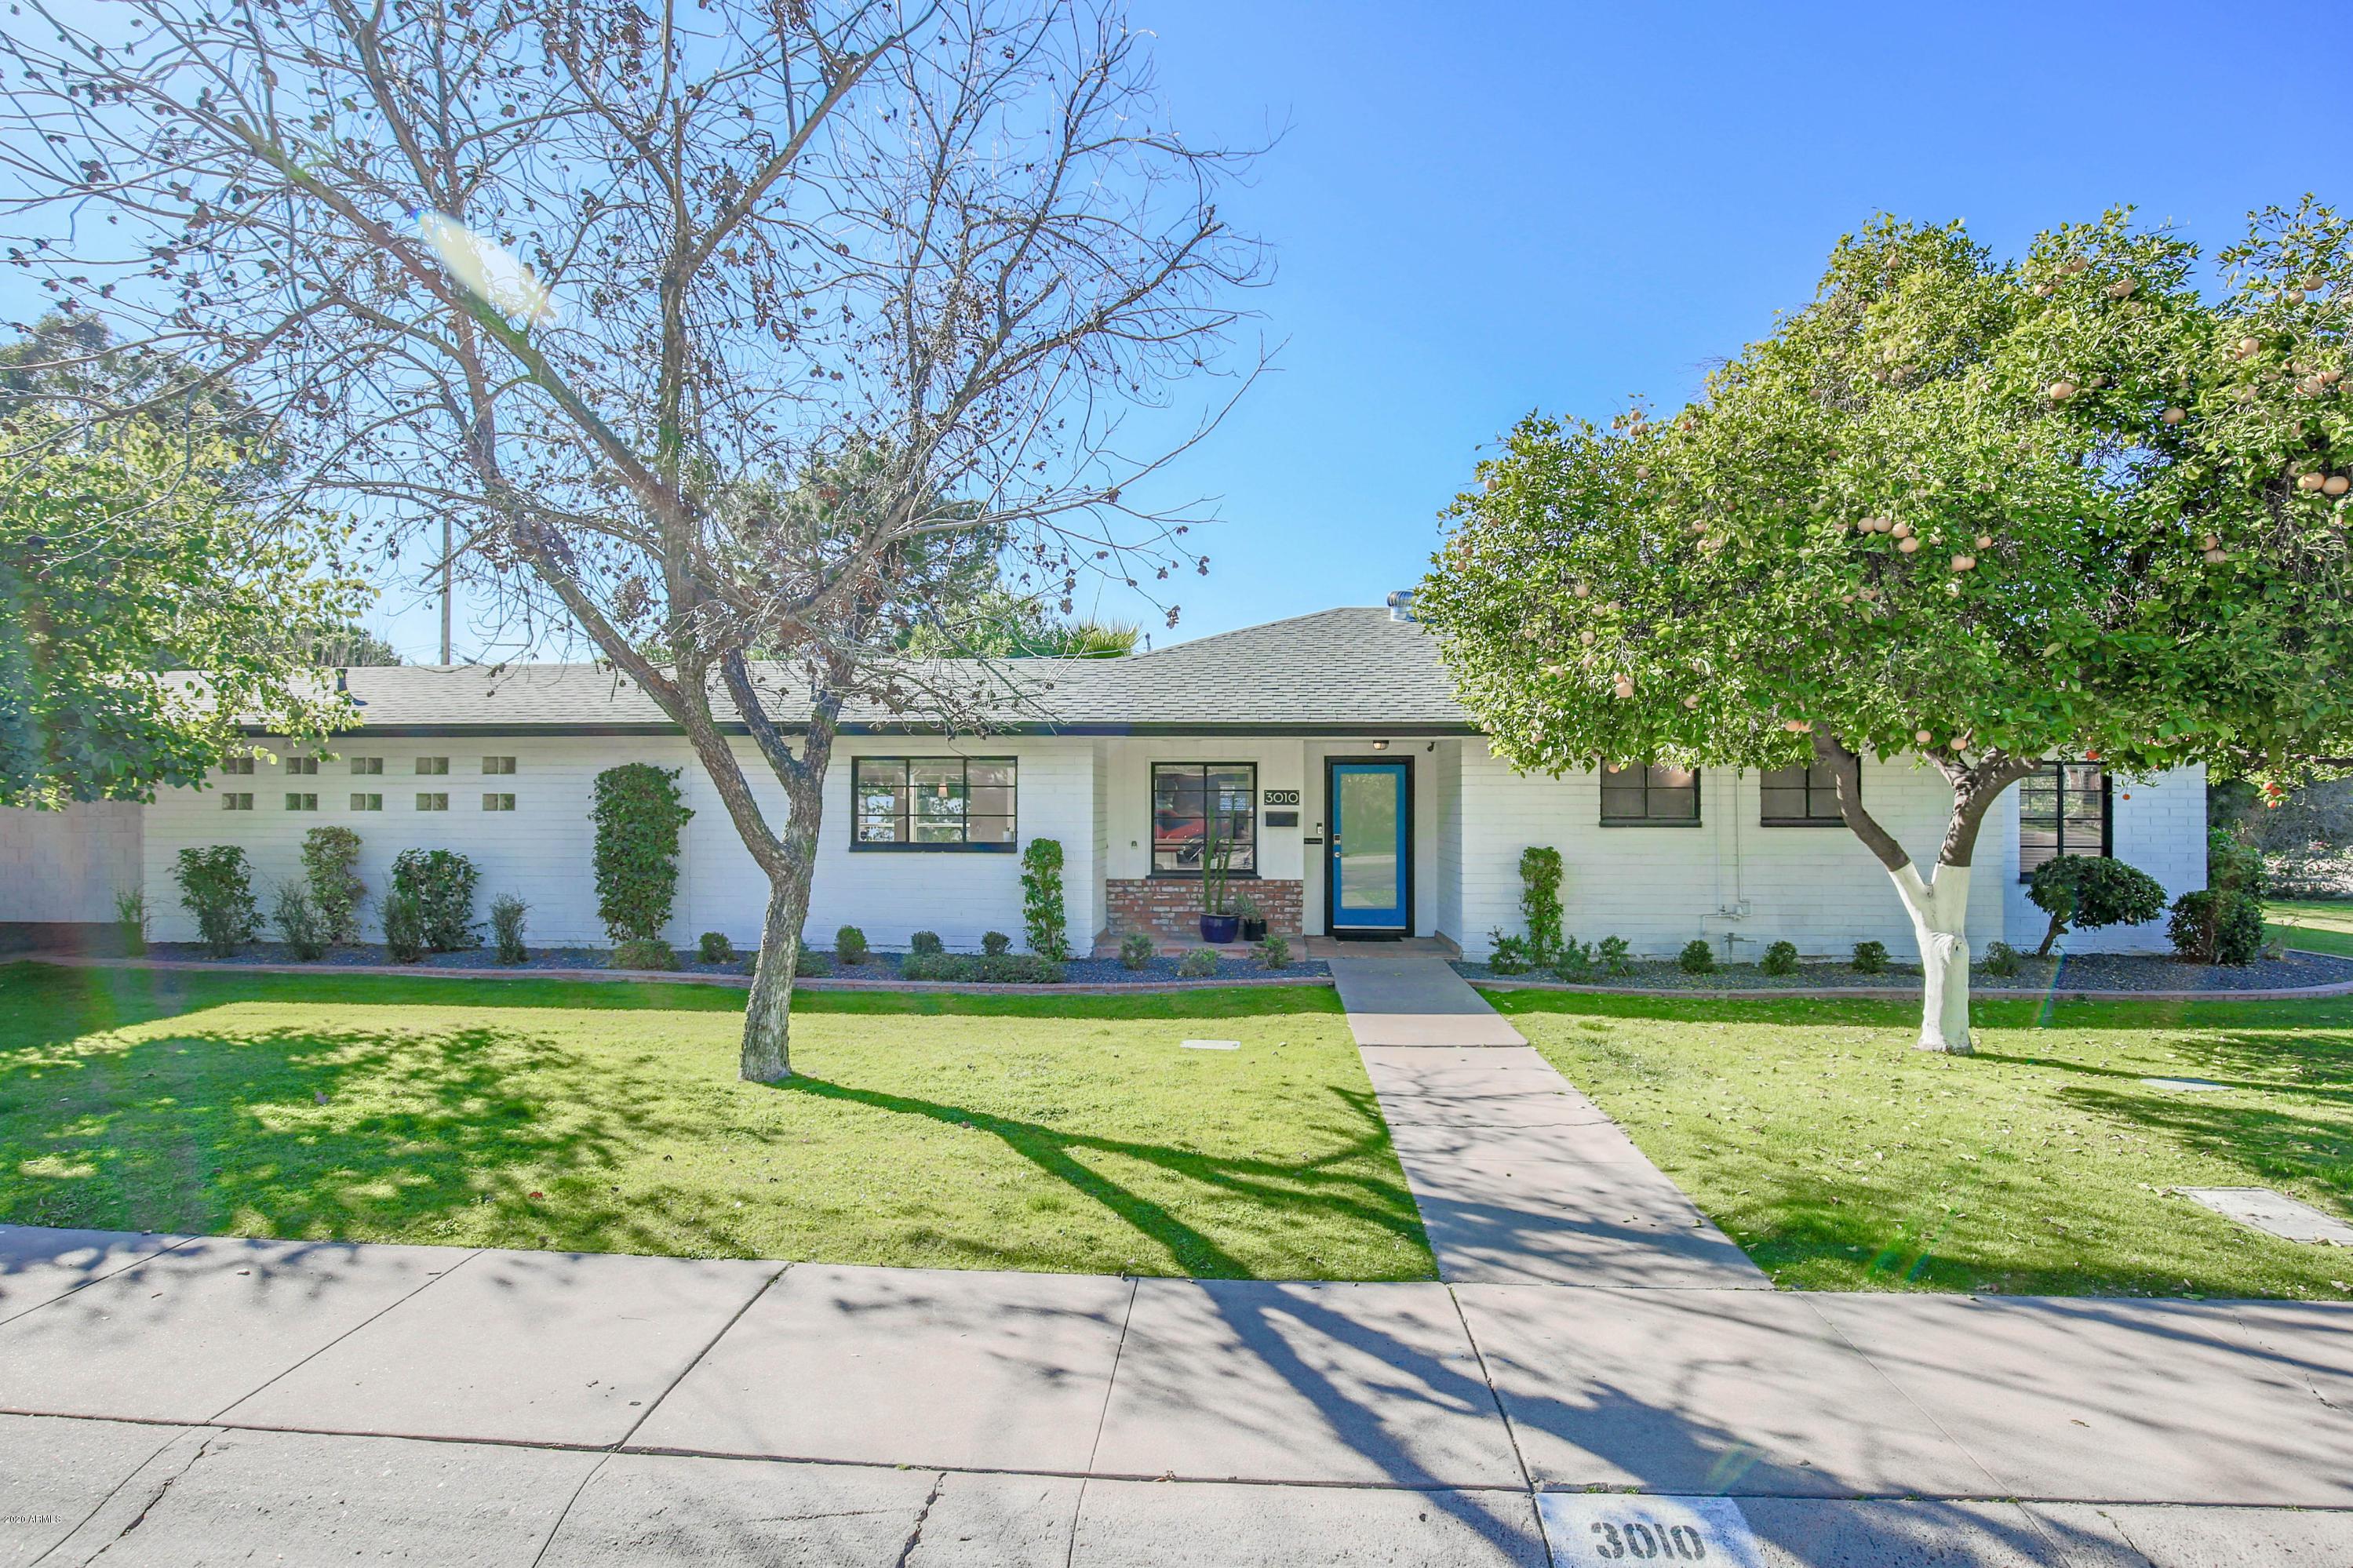 Photo of 3010 N 18TH Avenue, Phoenix, AZ 85015